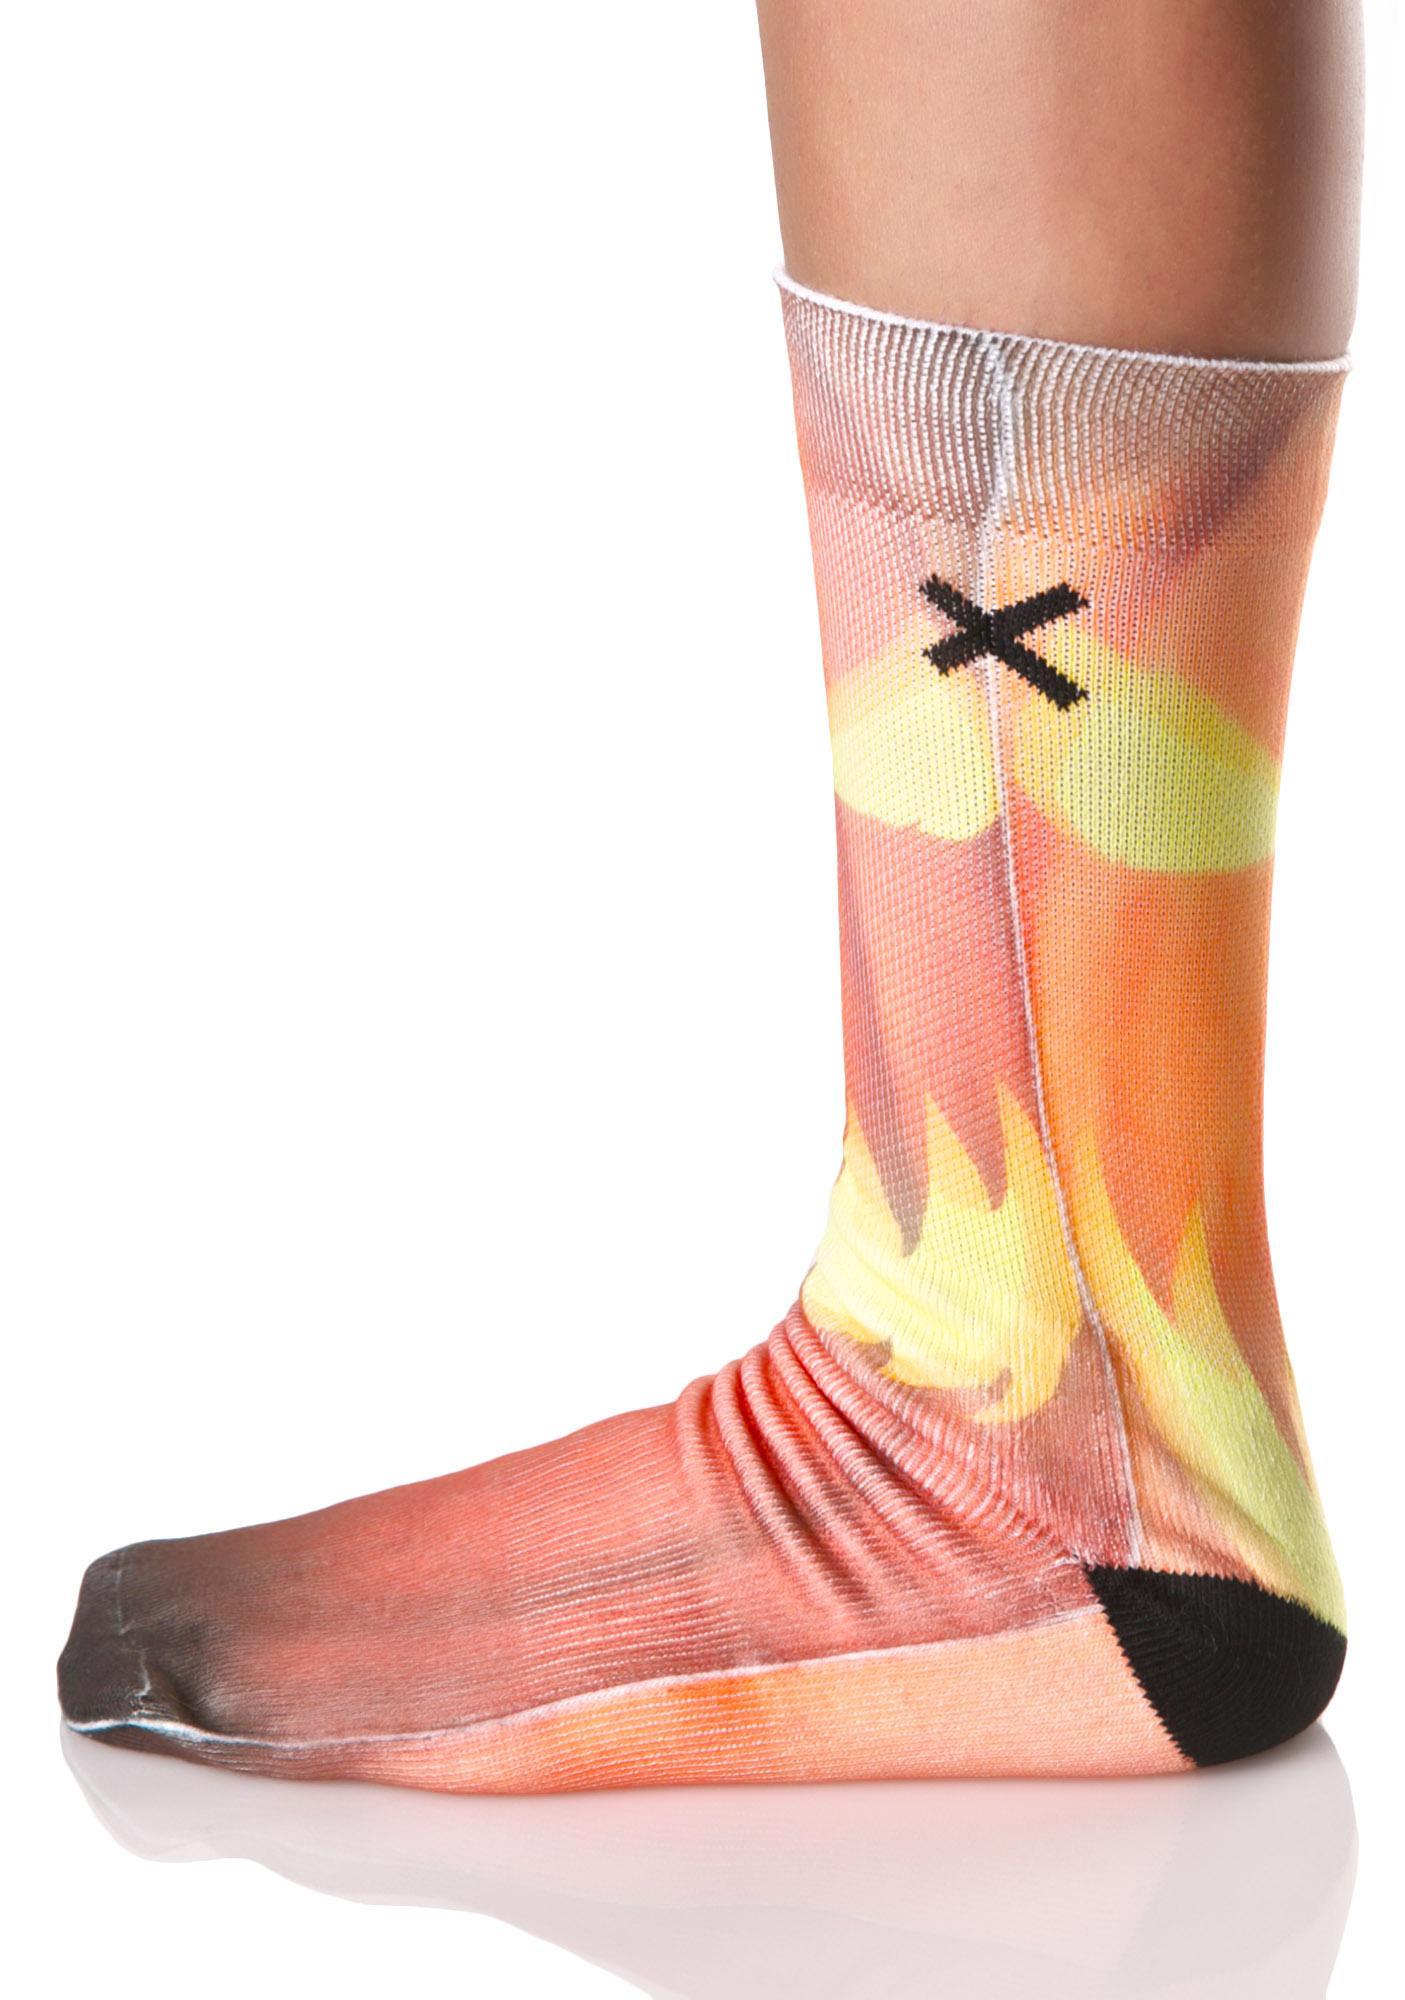 Odd Sox Jack O Lantern Socks